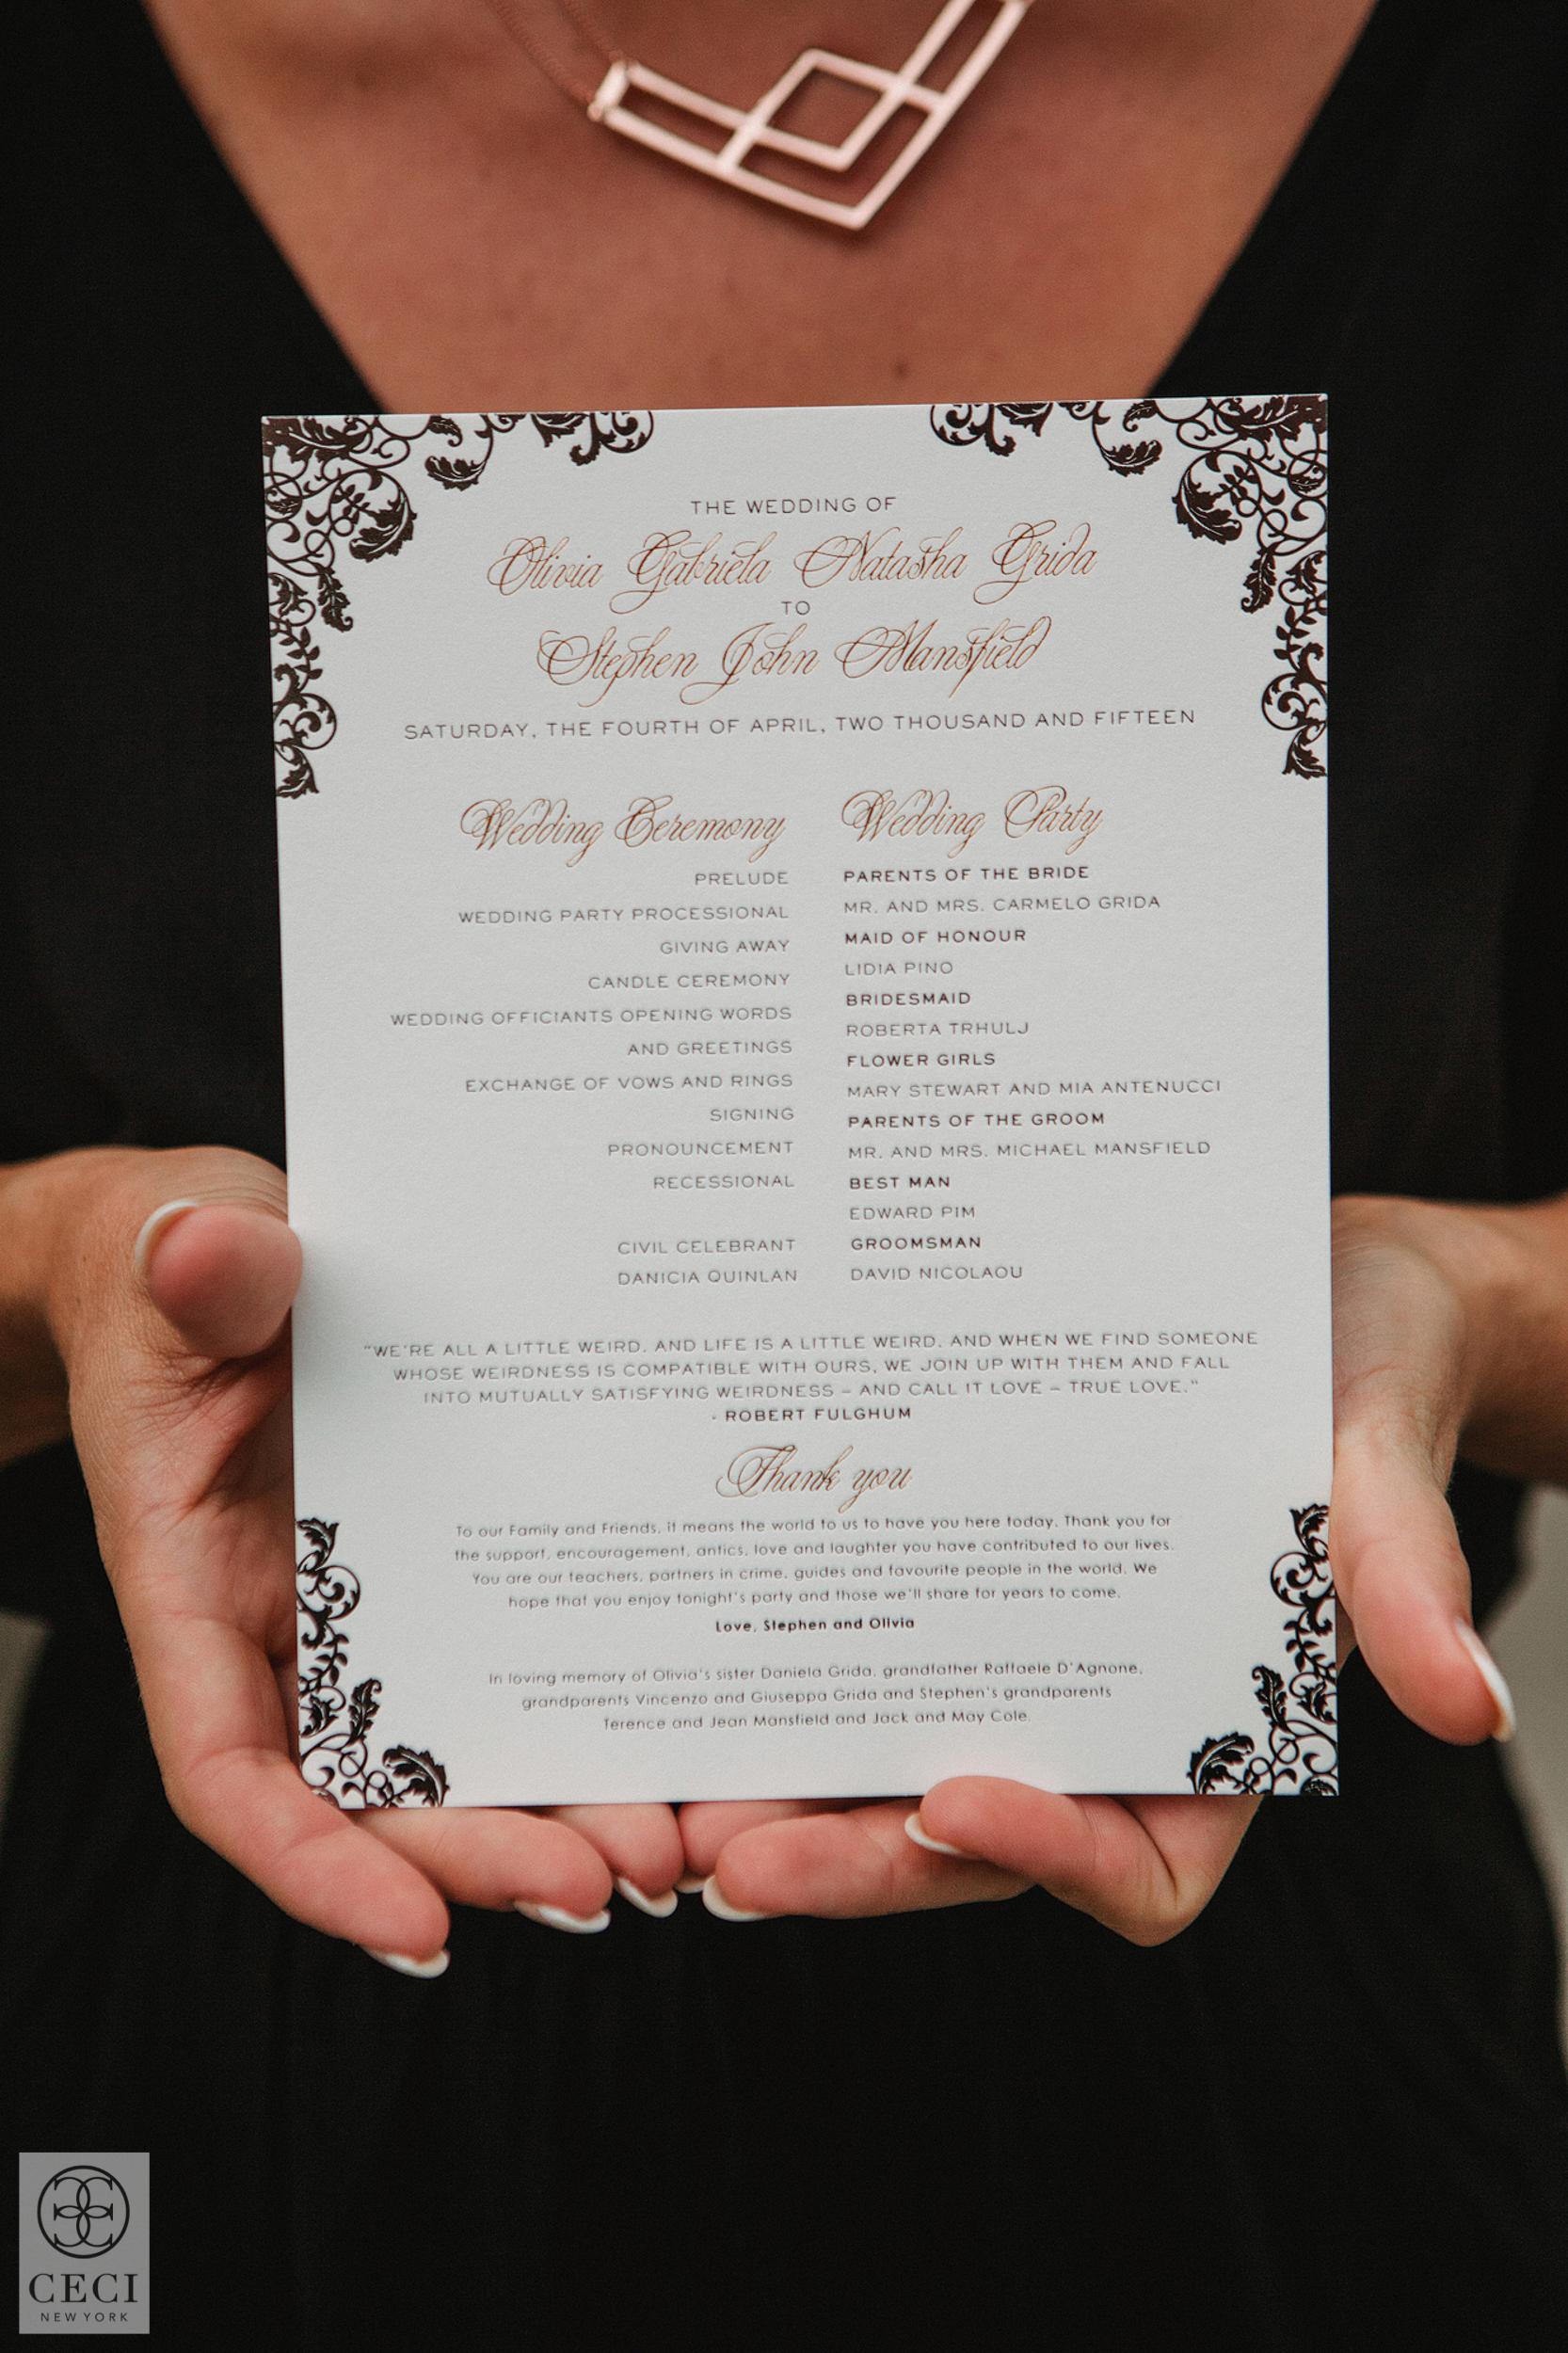 Ceci_New_York_Custom_Luxury_Wedding_BeautyShot_LaserCut_Stationery_Personalized_Couture_Foil_Stamping_Perth_Destination_Australia_Chic_-7.jpg